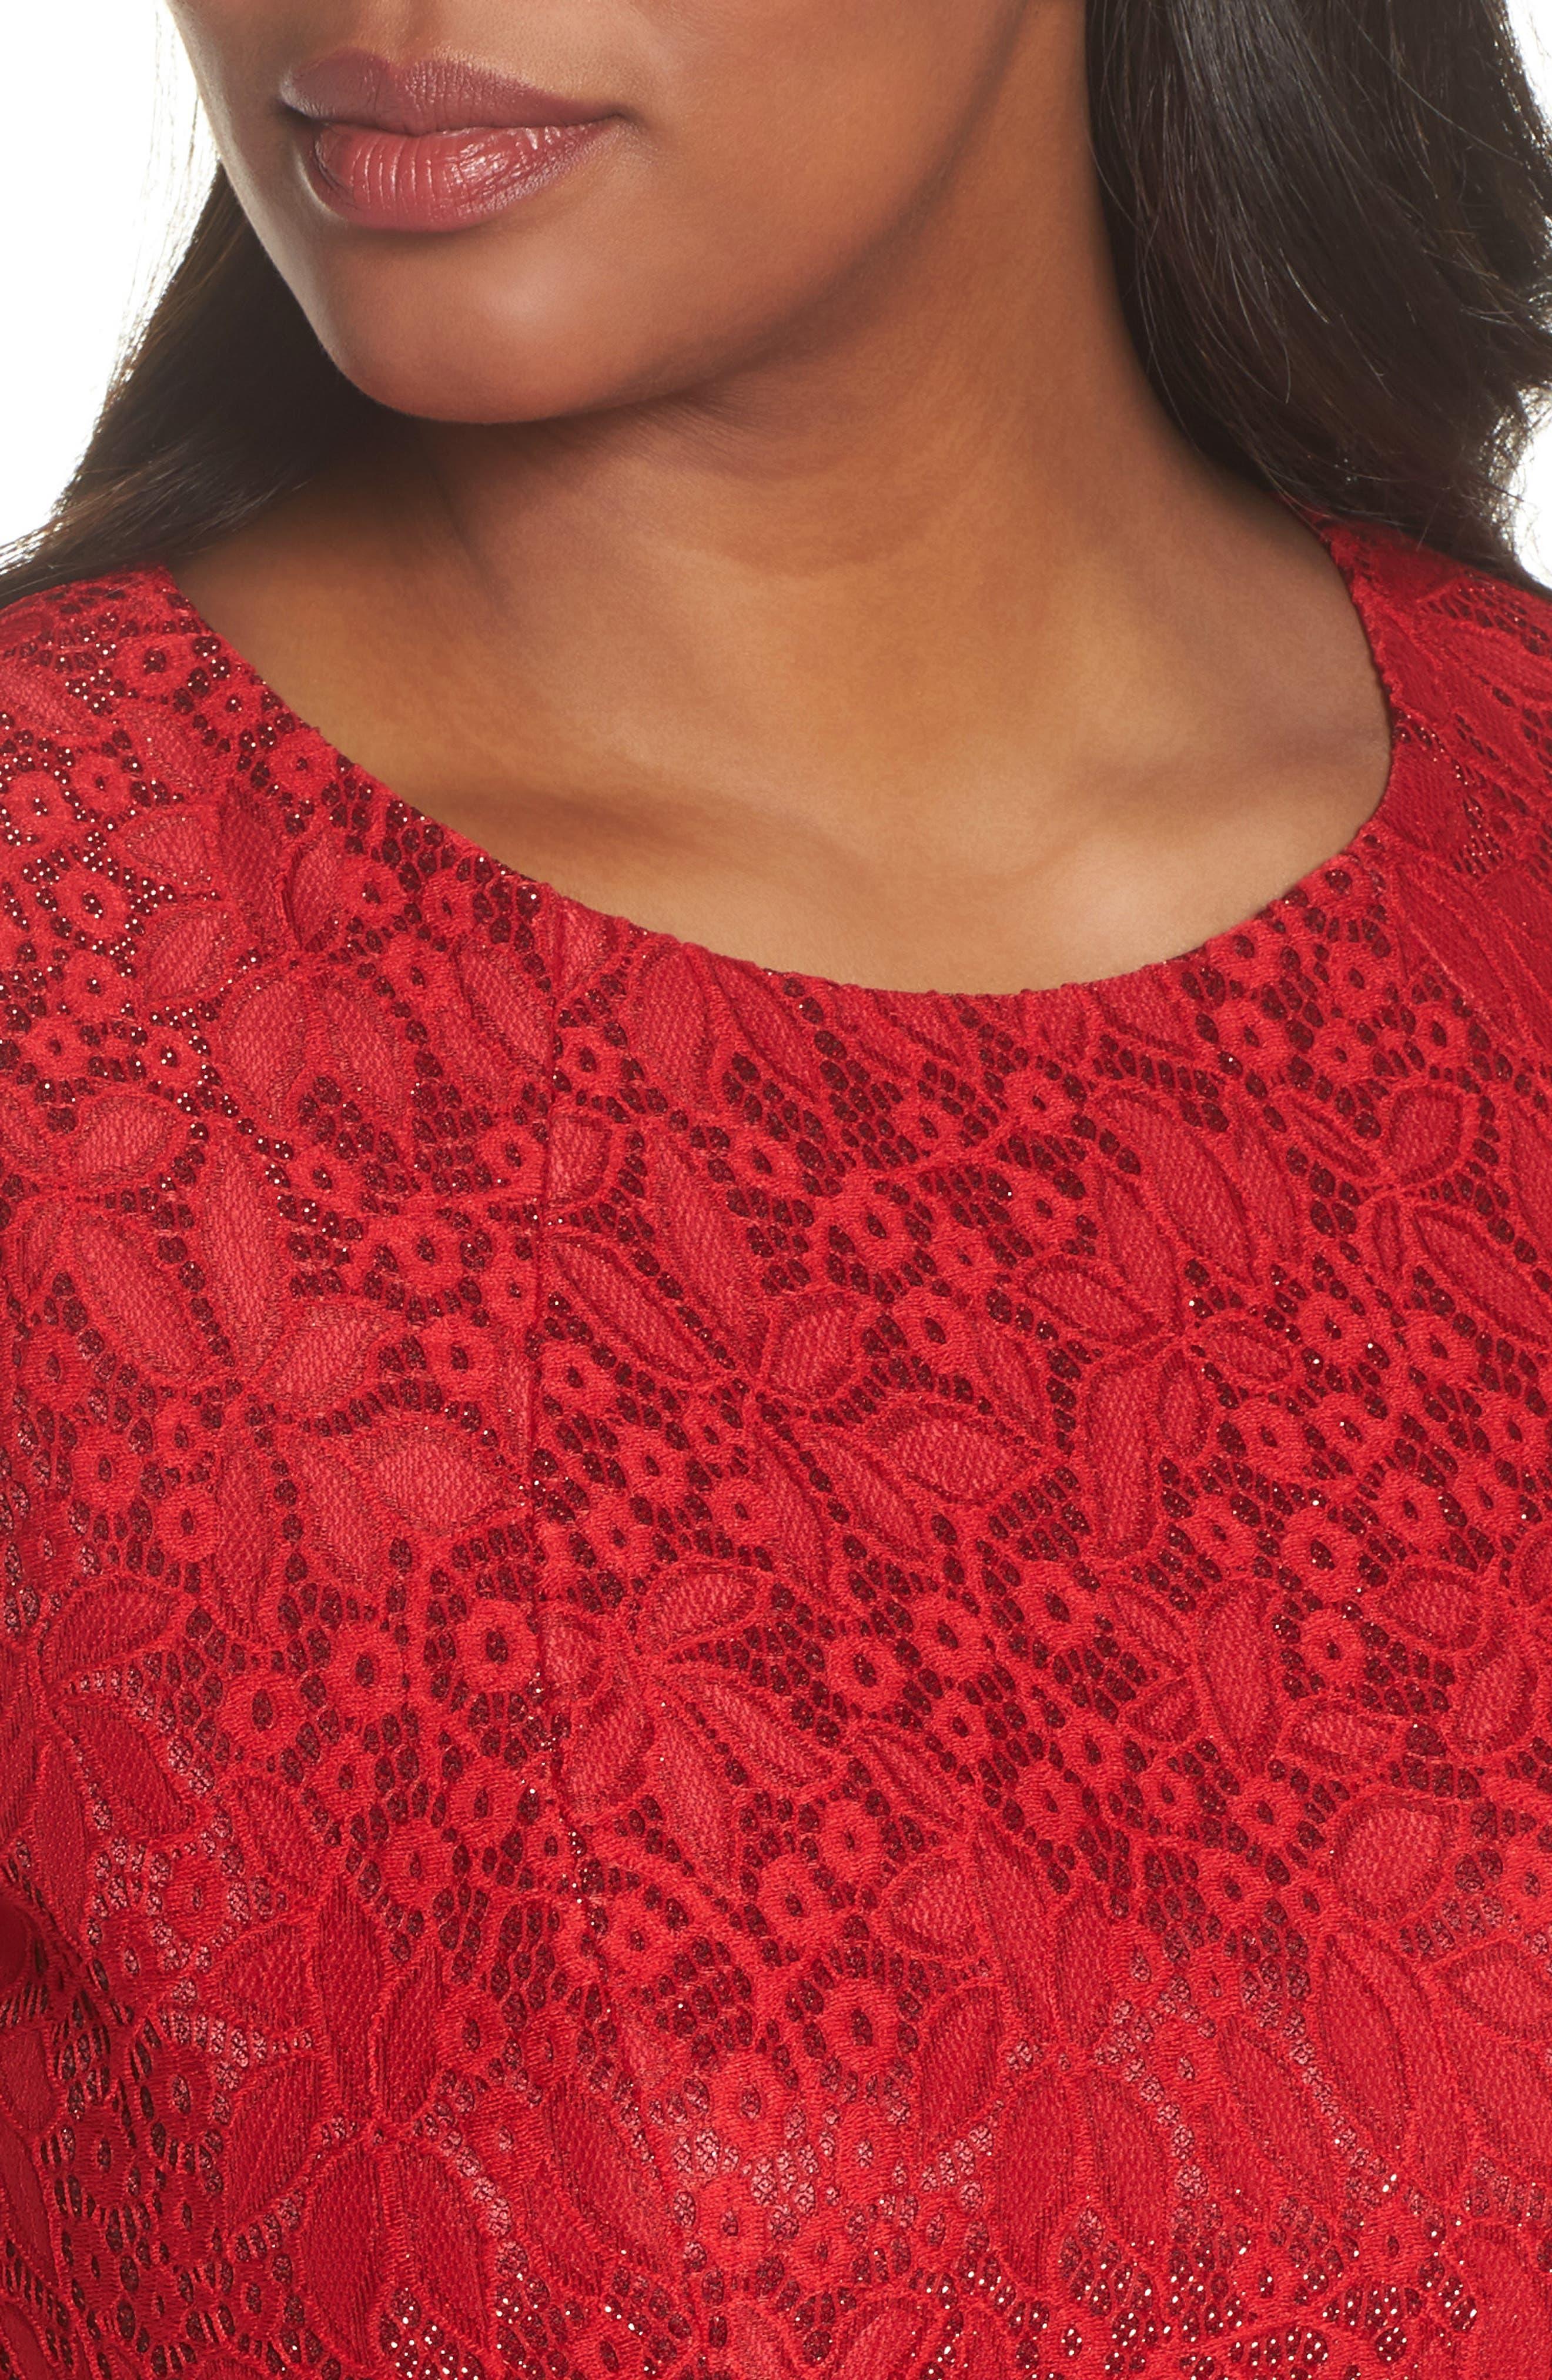 Shimmer Lace Sheath Dress,                             Alternate thumbnail 4, color,                             620